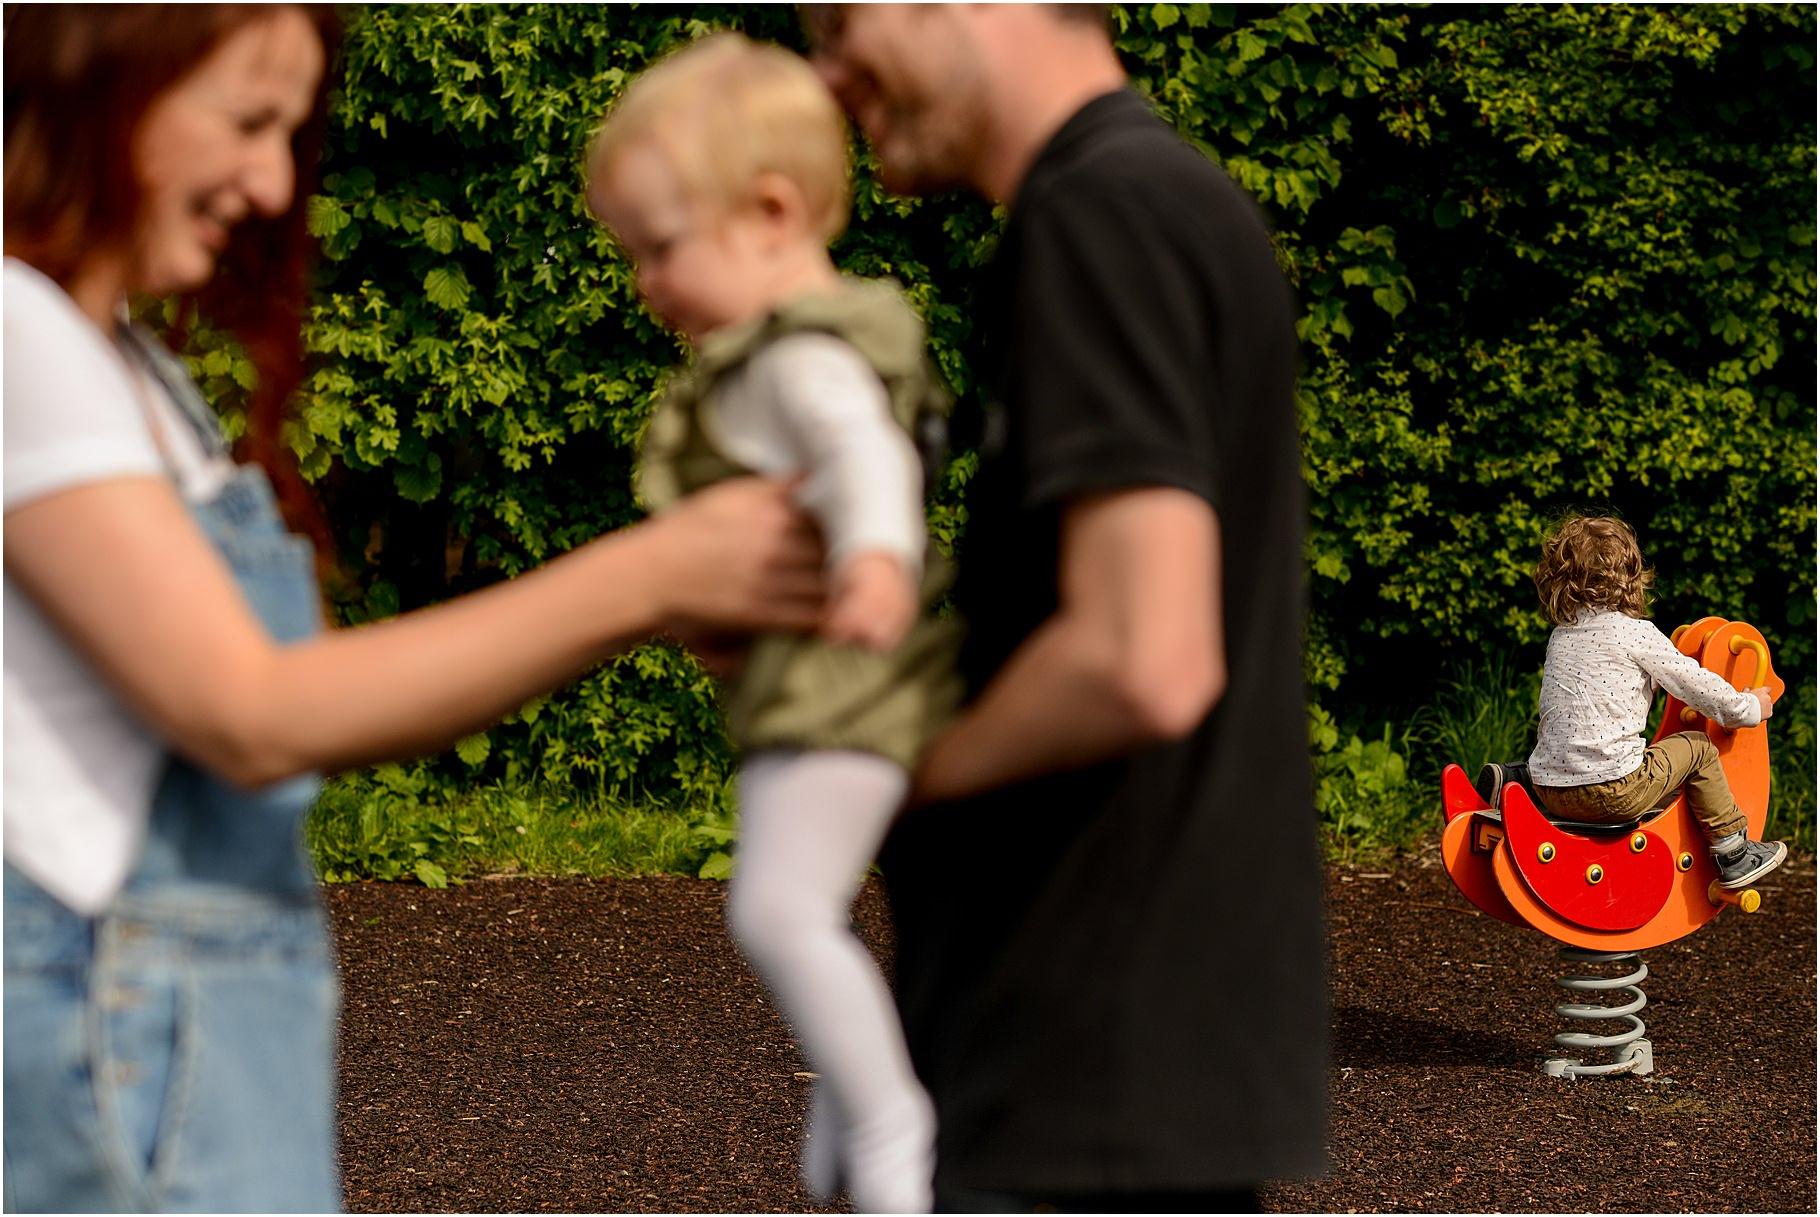 lancashire-family-photographer-04.jpg